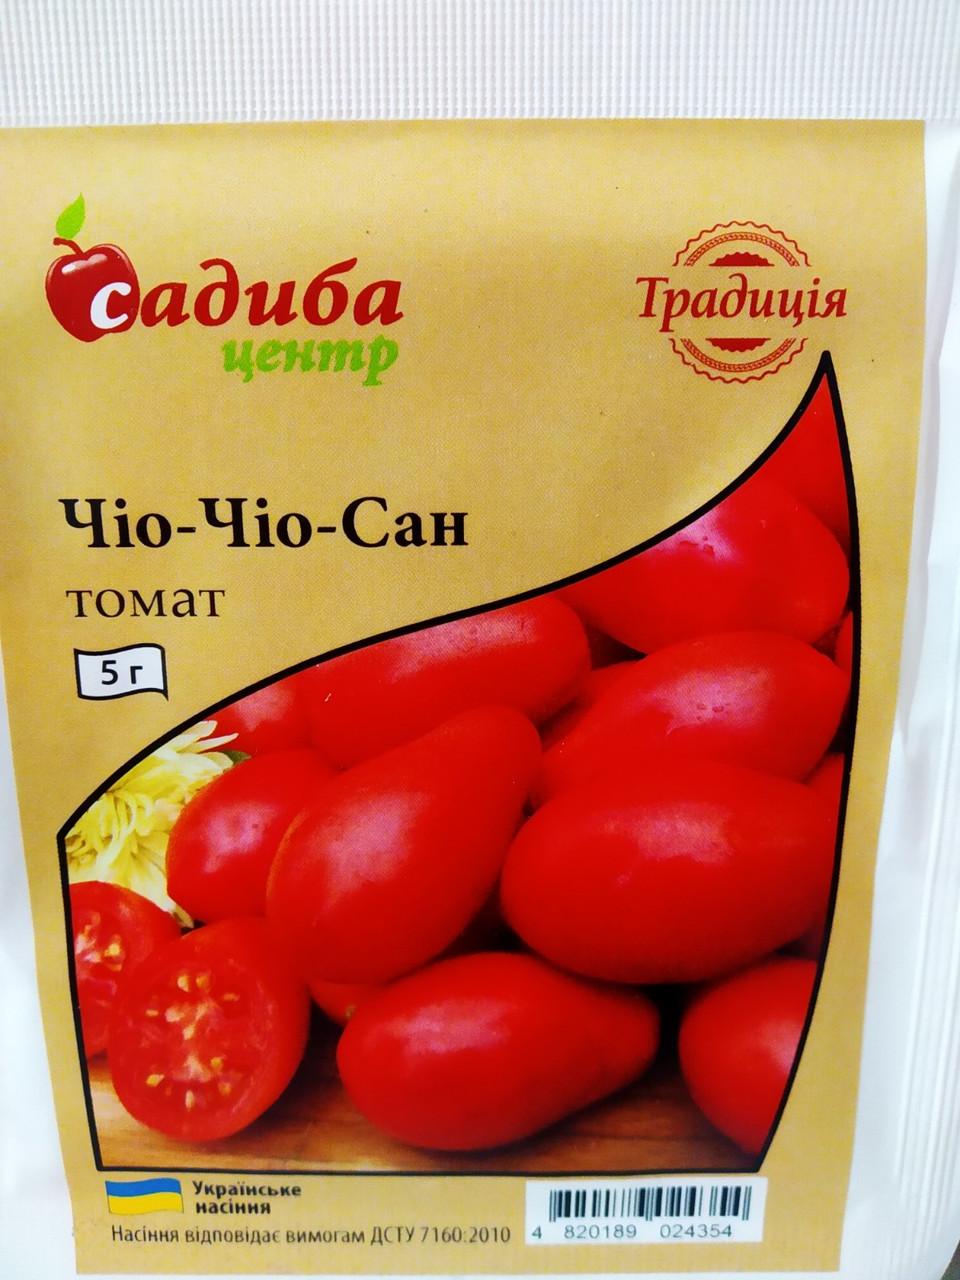 "Семена томата среднераннего  Чио-чио-сан 5 грамм, ""Садыба центр"", Украина"